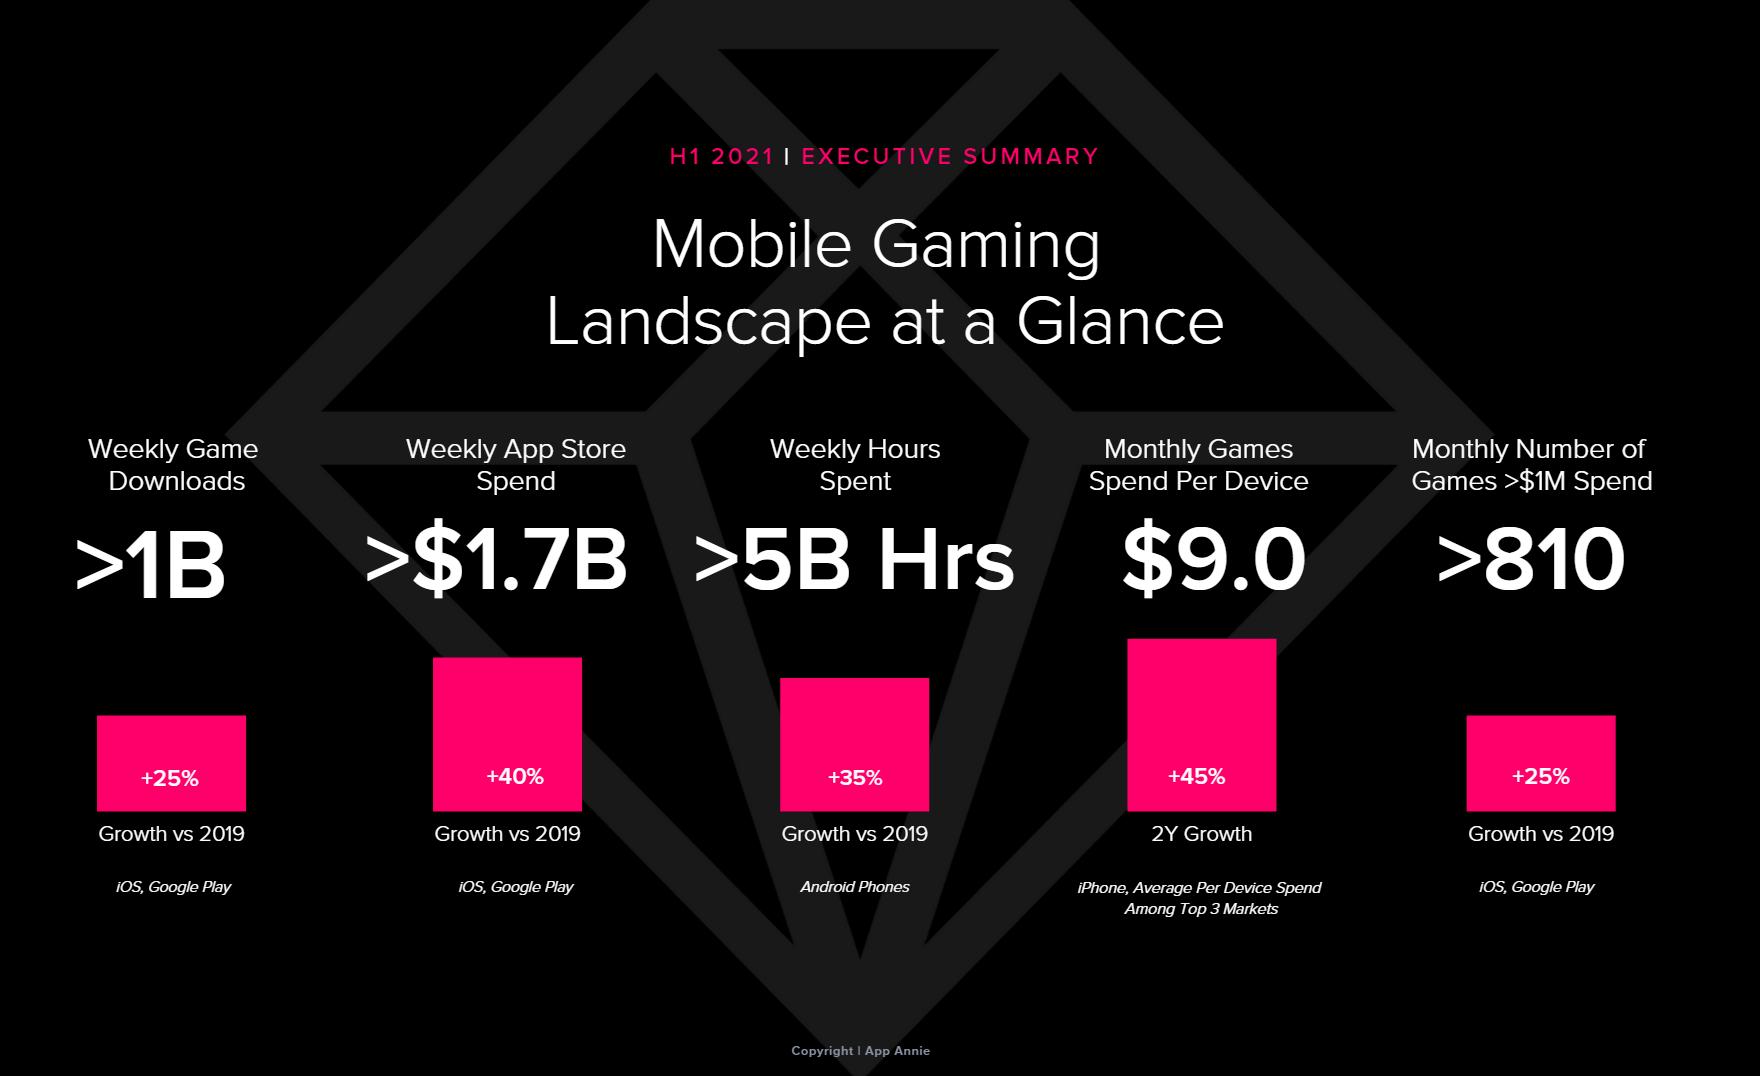 More Than Half a Dozen Mobile Games Earn Over $100 Million a Month